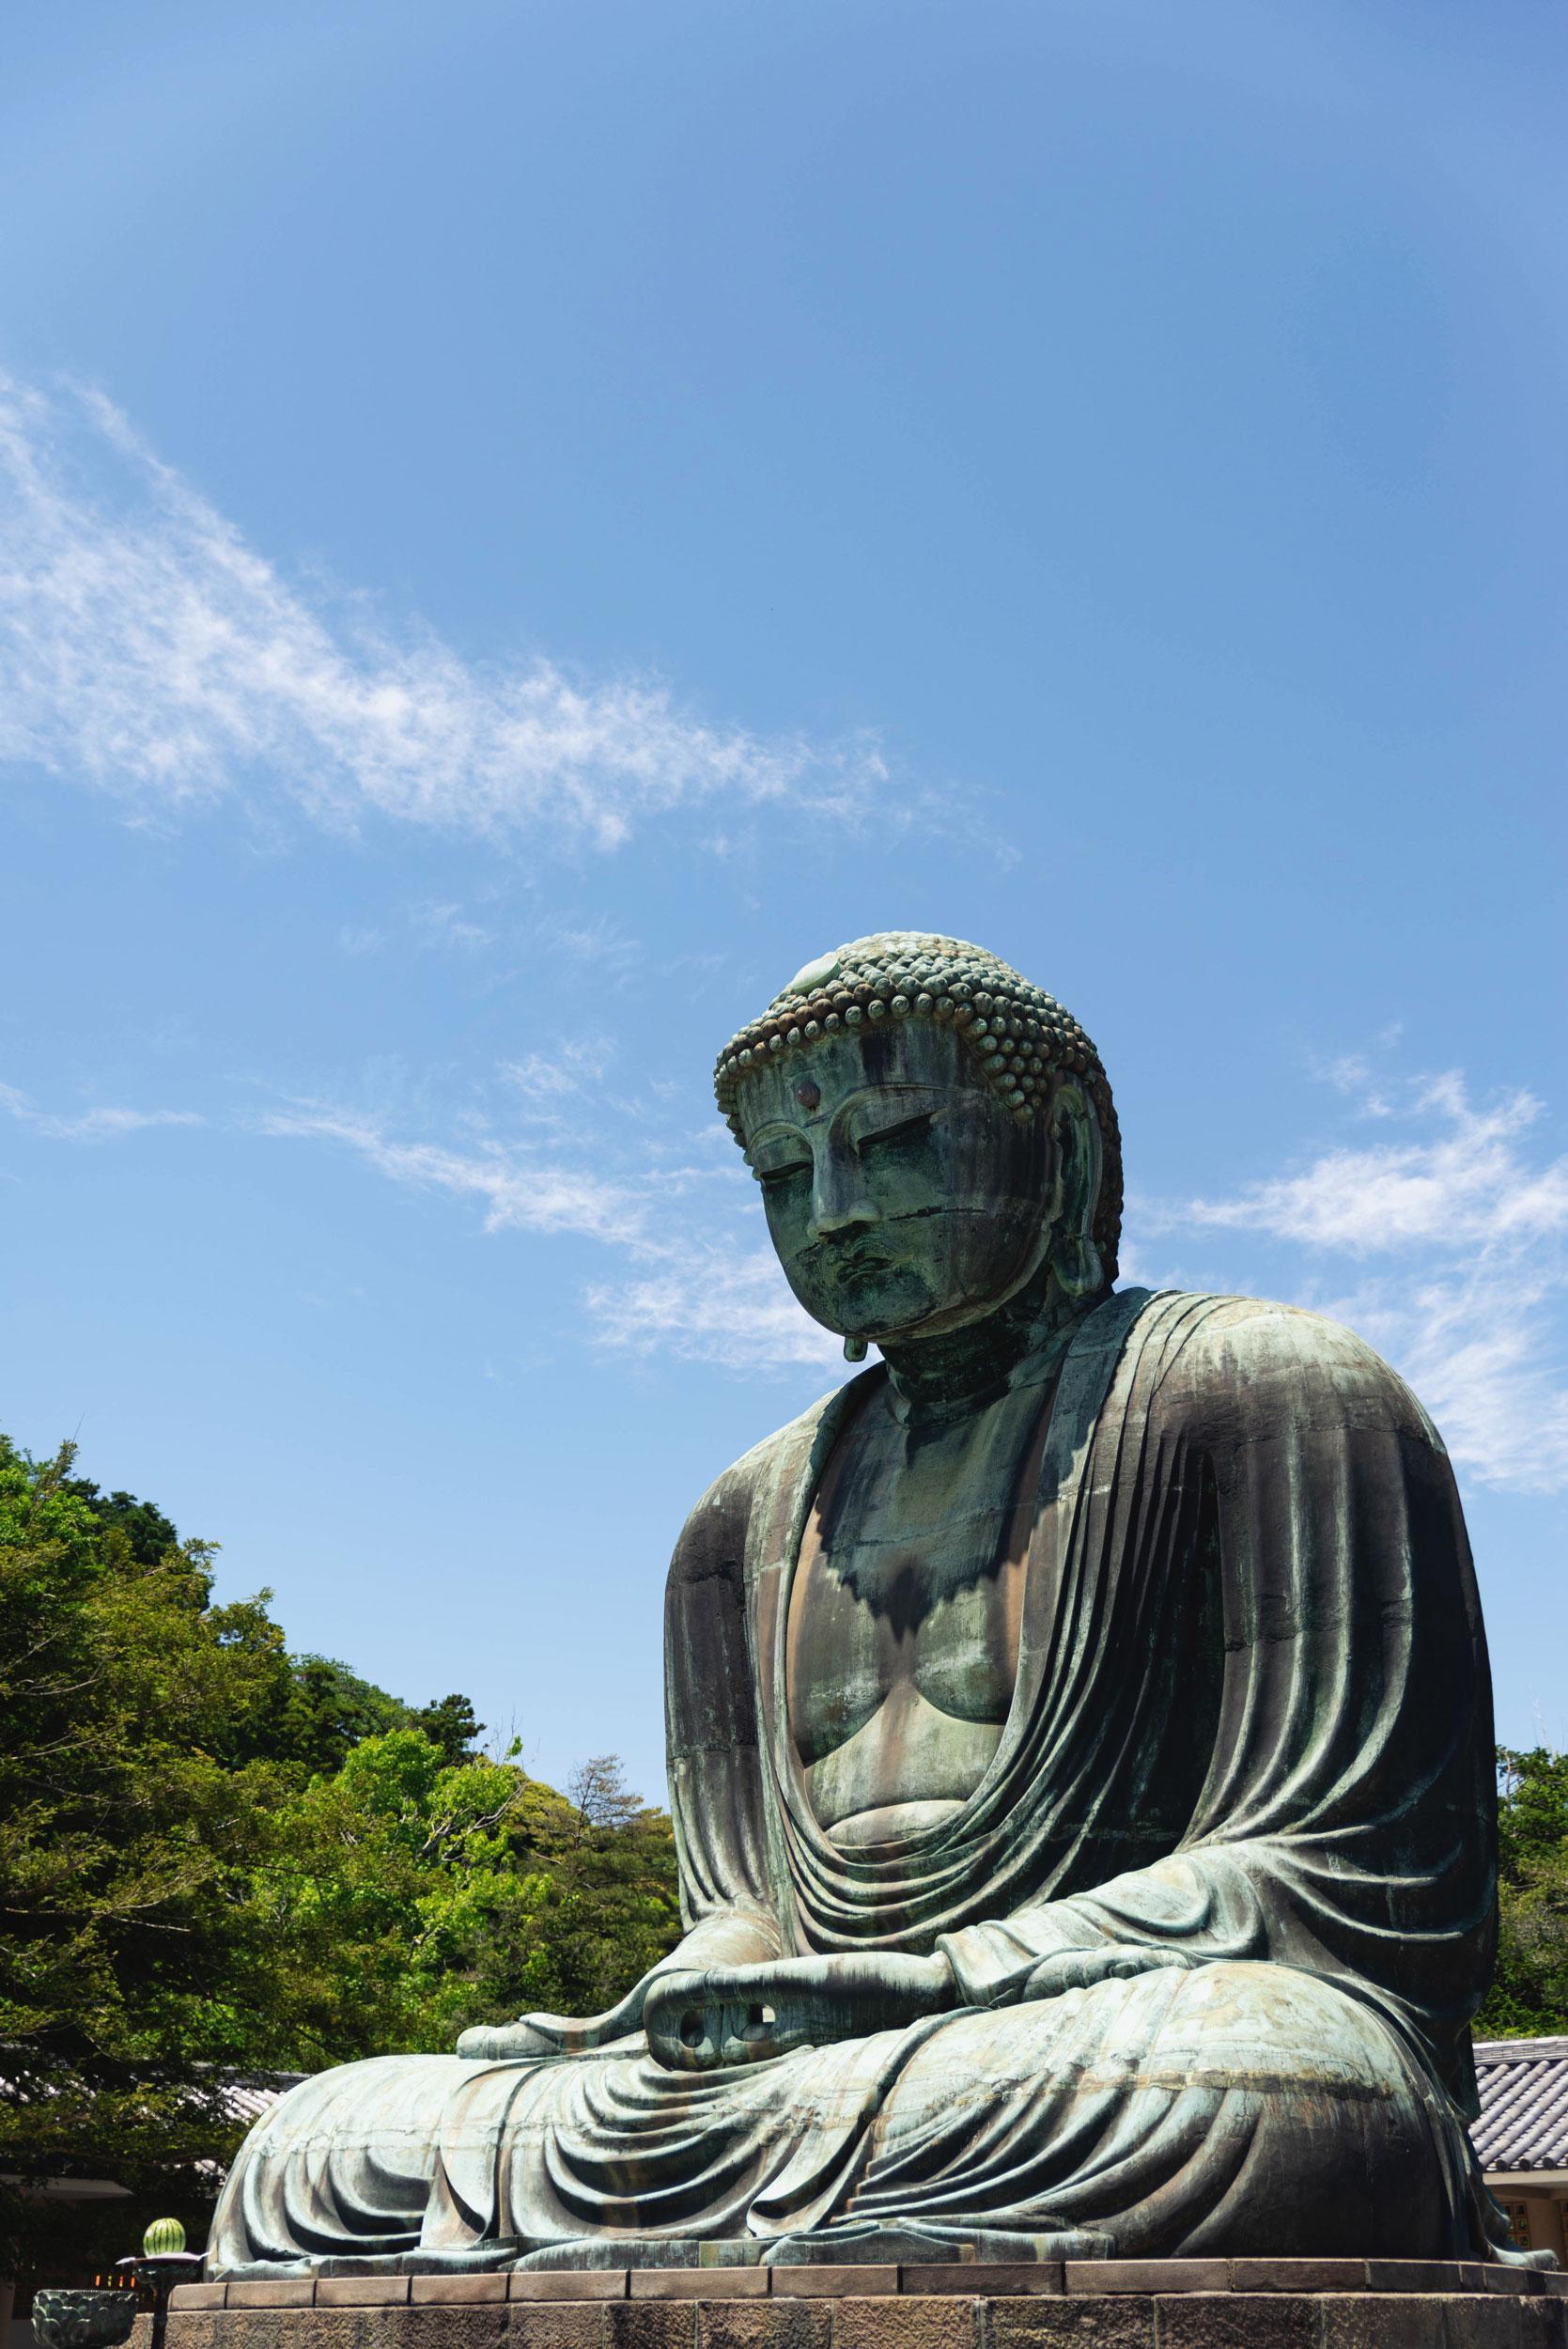 Kamakura Daibutsu at the Kotoku-in temple in Kamakura